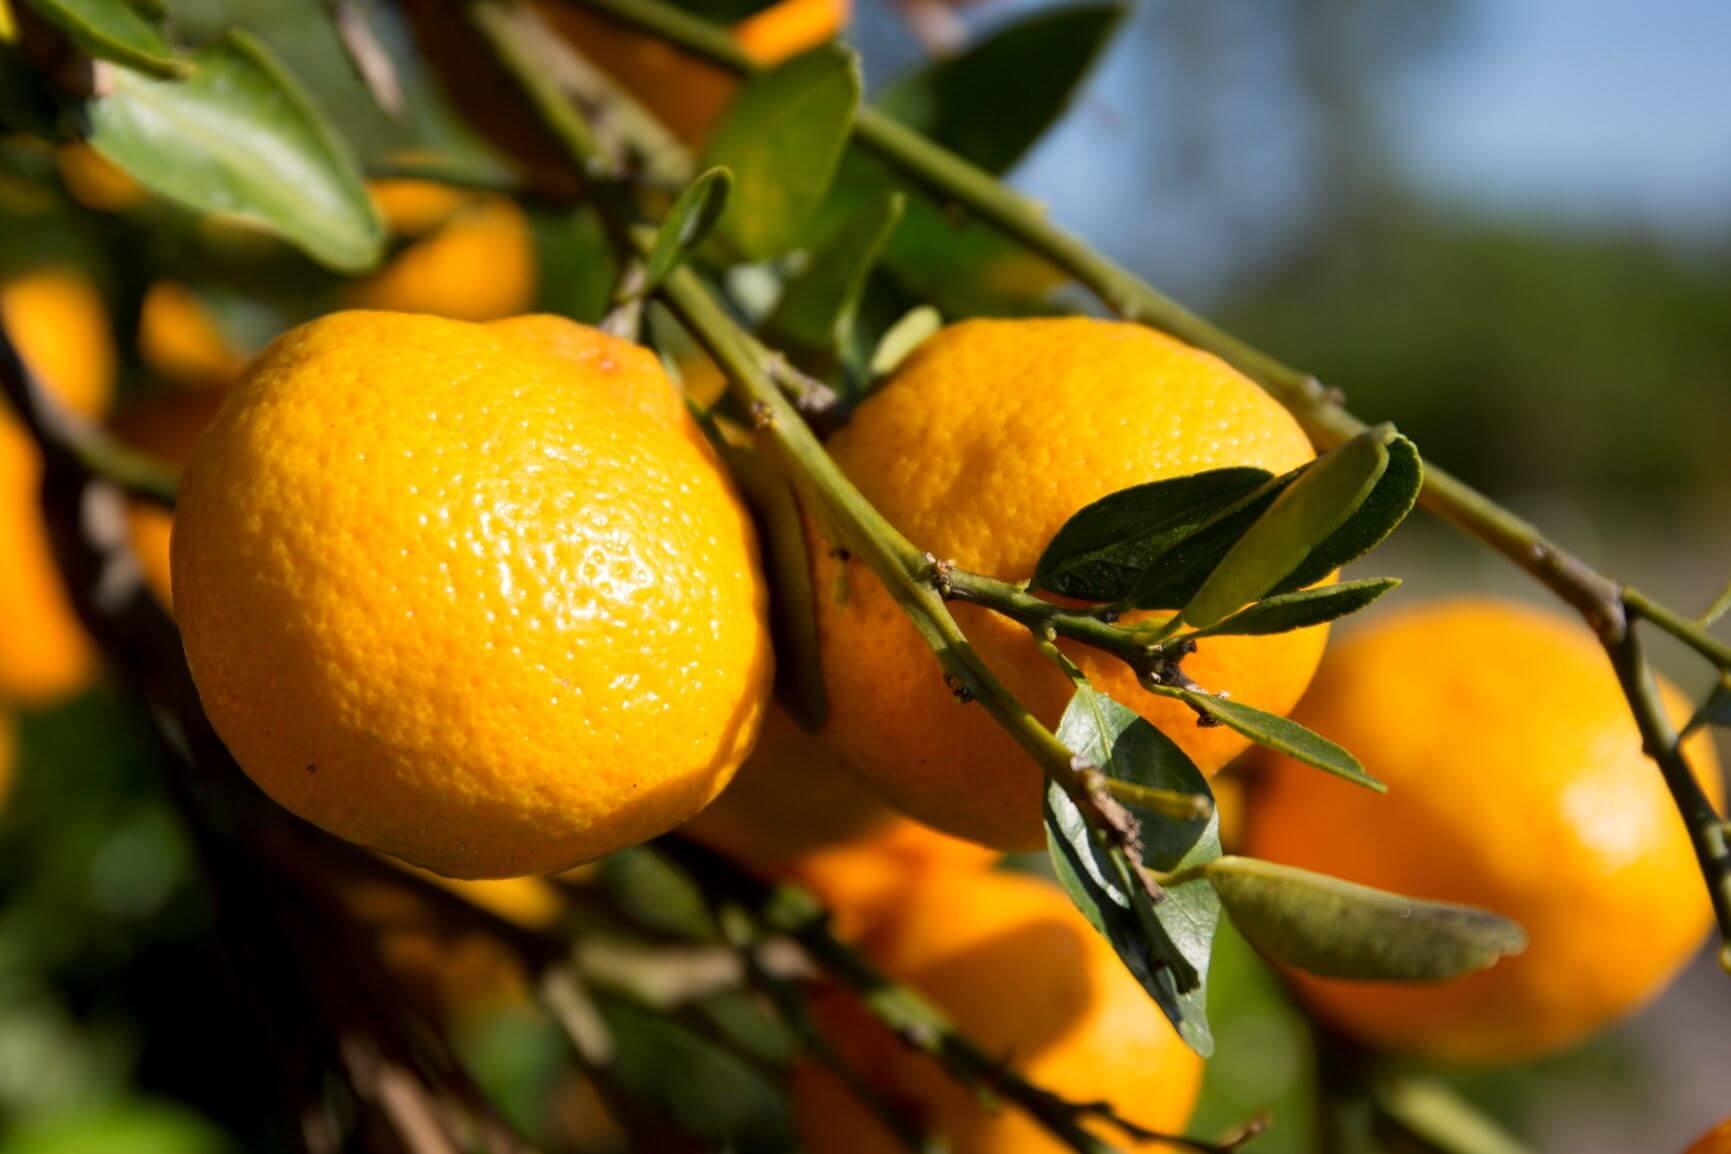 paraziták a citrus levelein